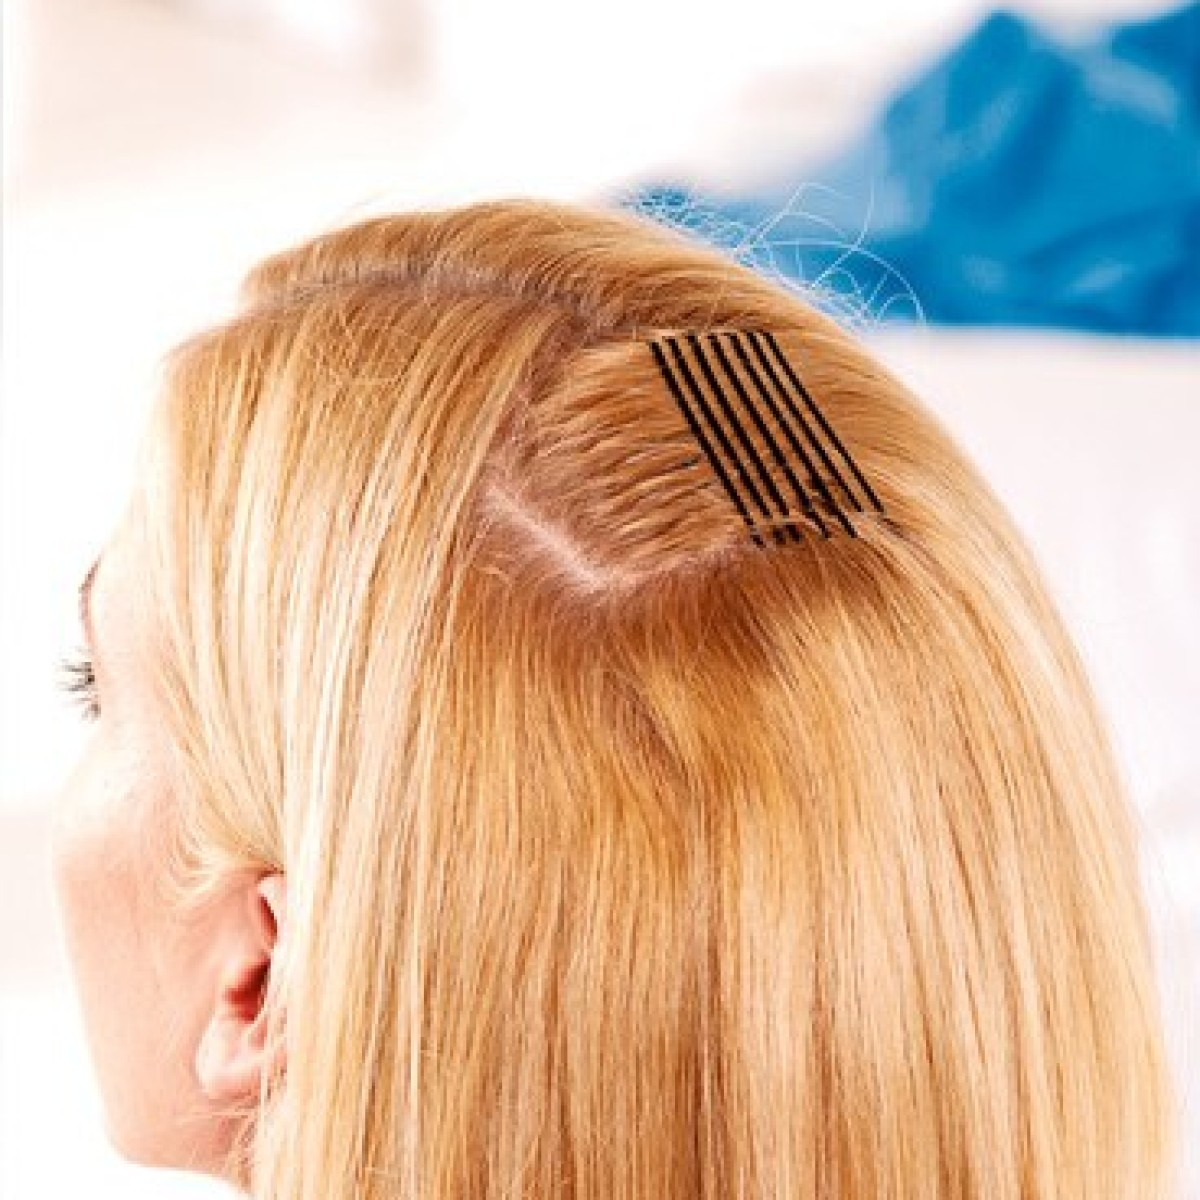 Haarwirbel hinterkopf